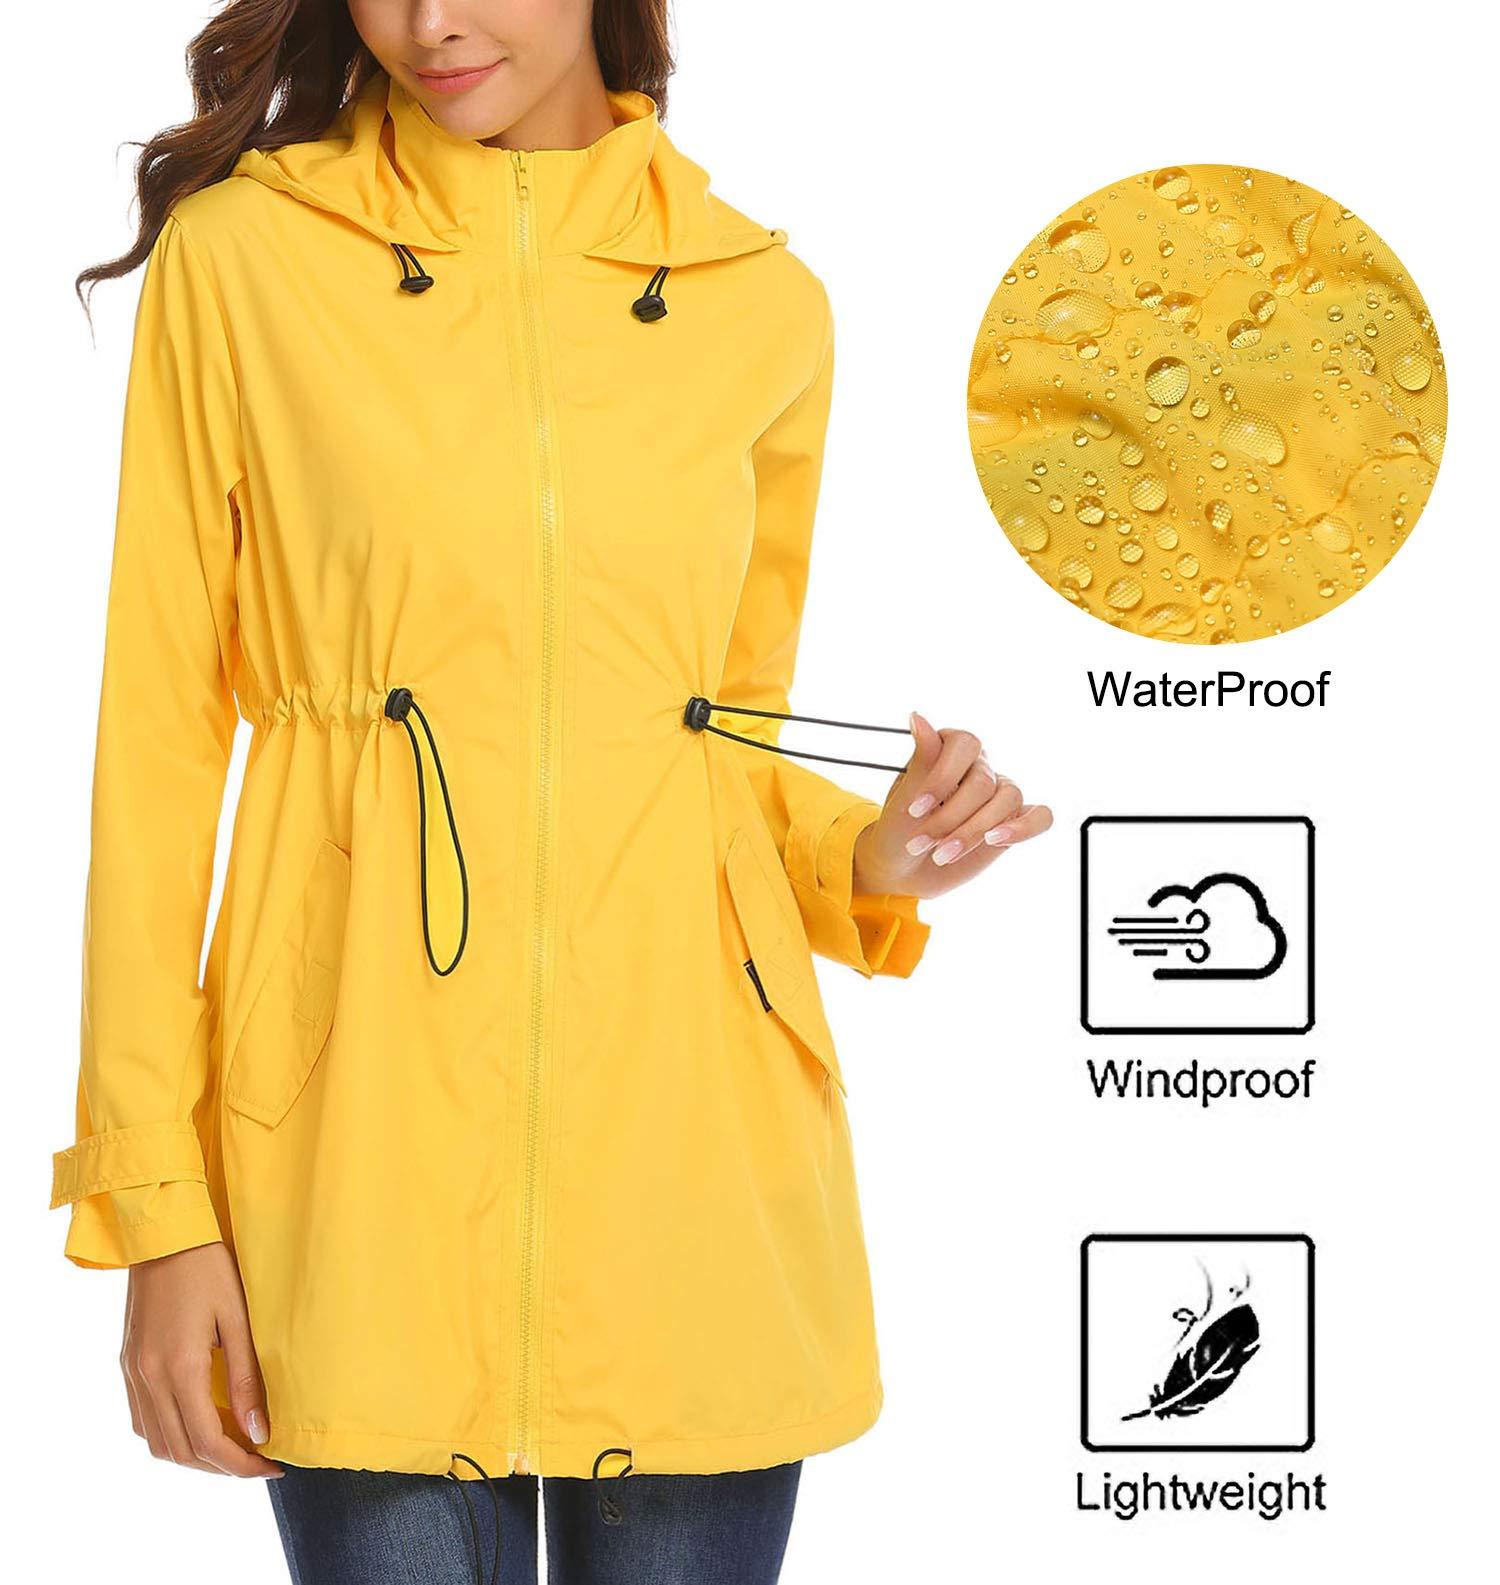 Mofavor Womens Travel Trench Waterproof Raincoat Hoodie Windproof Hiking Coat Packable Rain Jacket Yellow S